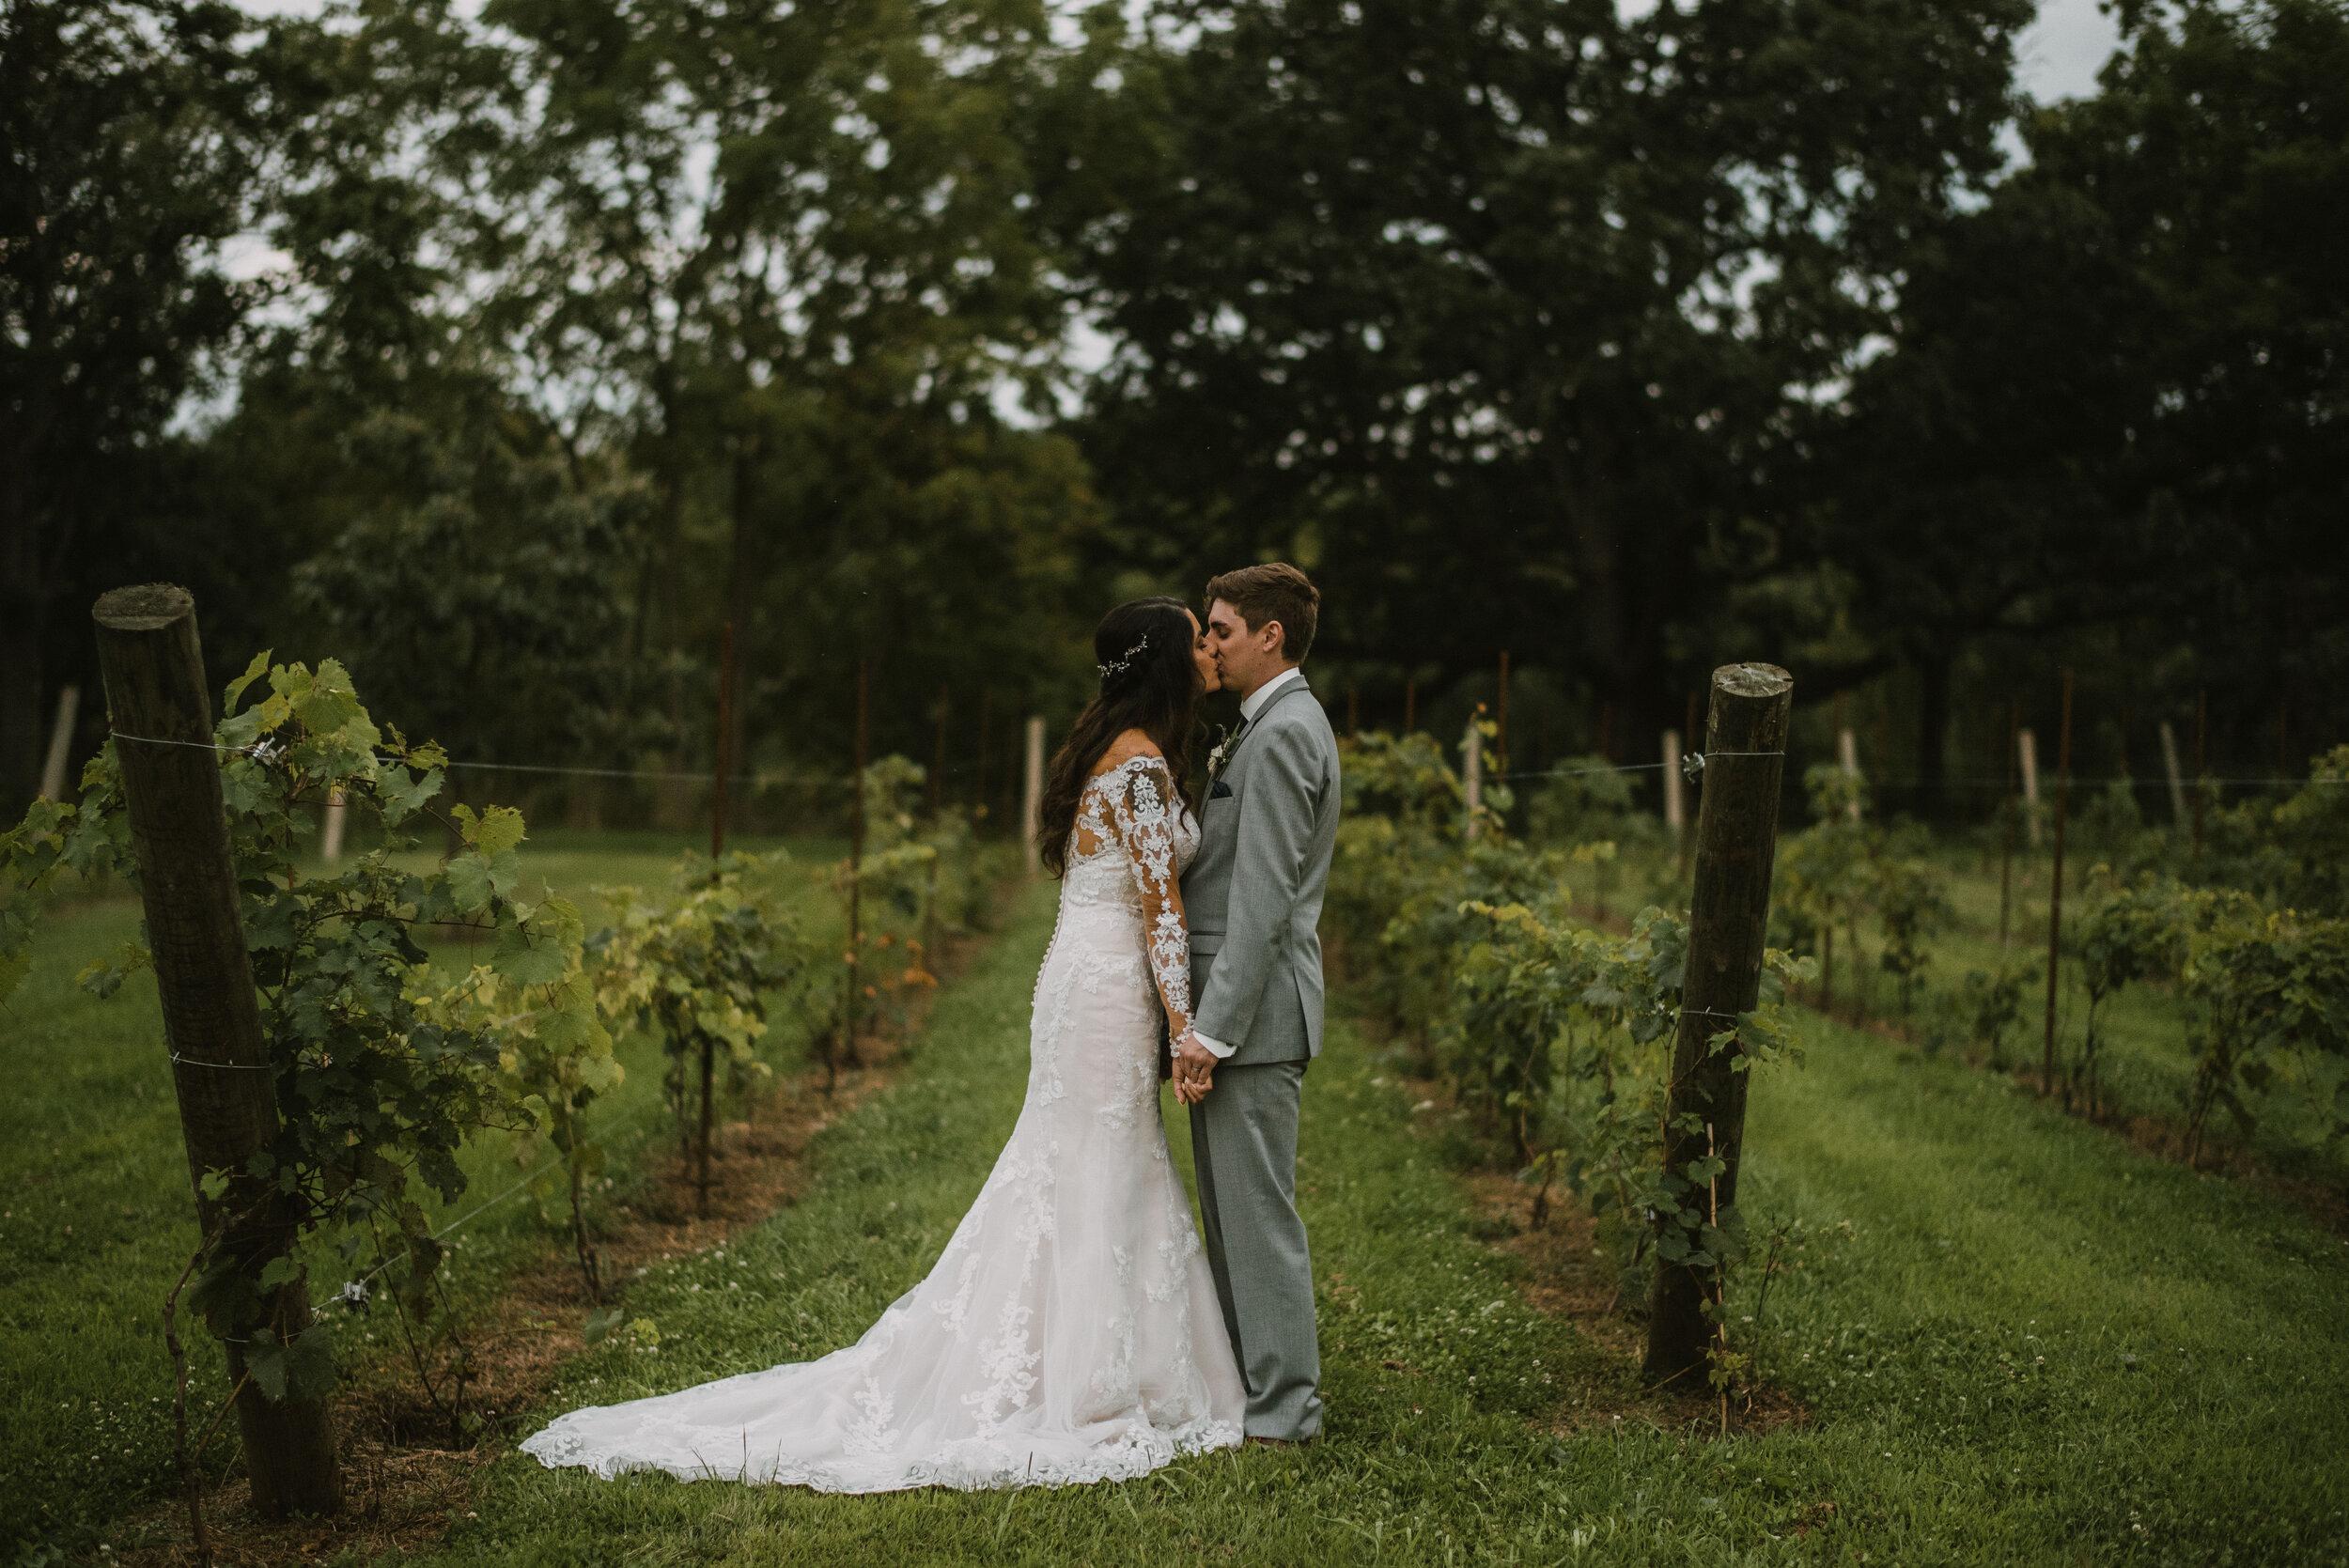 D&B-The Landing-Burlington Wedding Photographer Videographer-1108.jpg